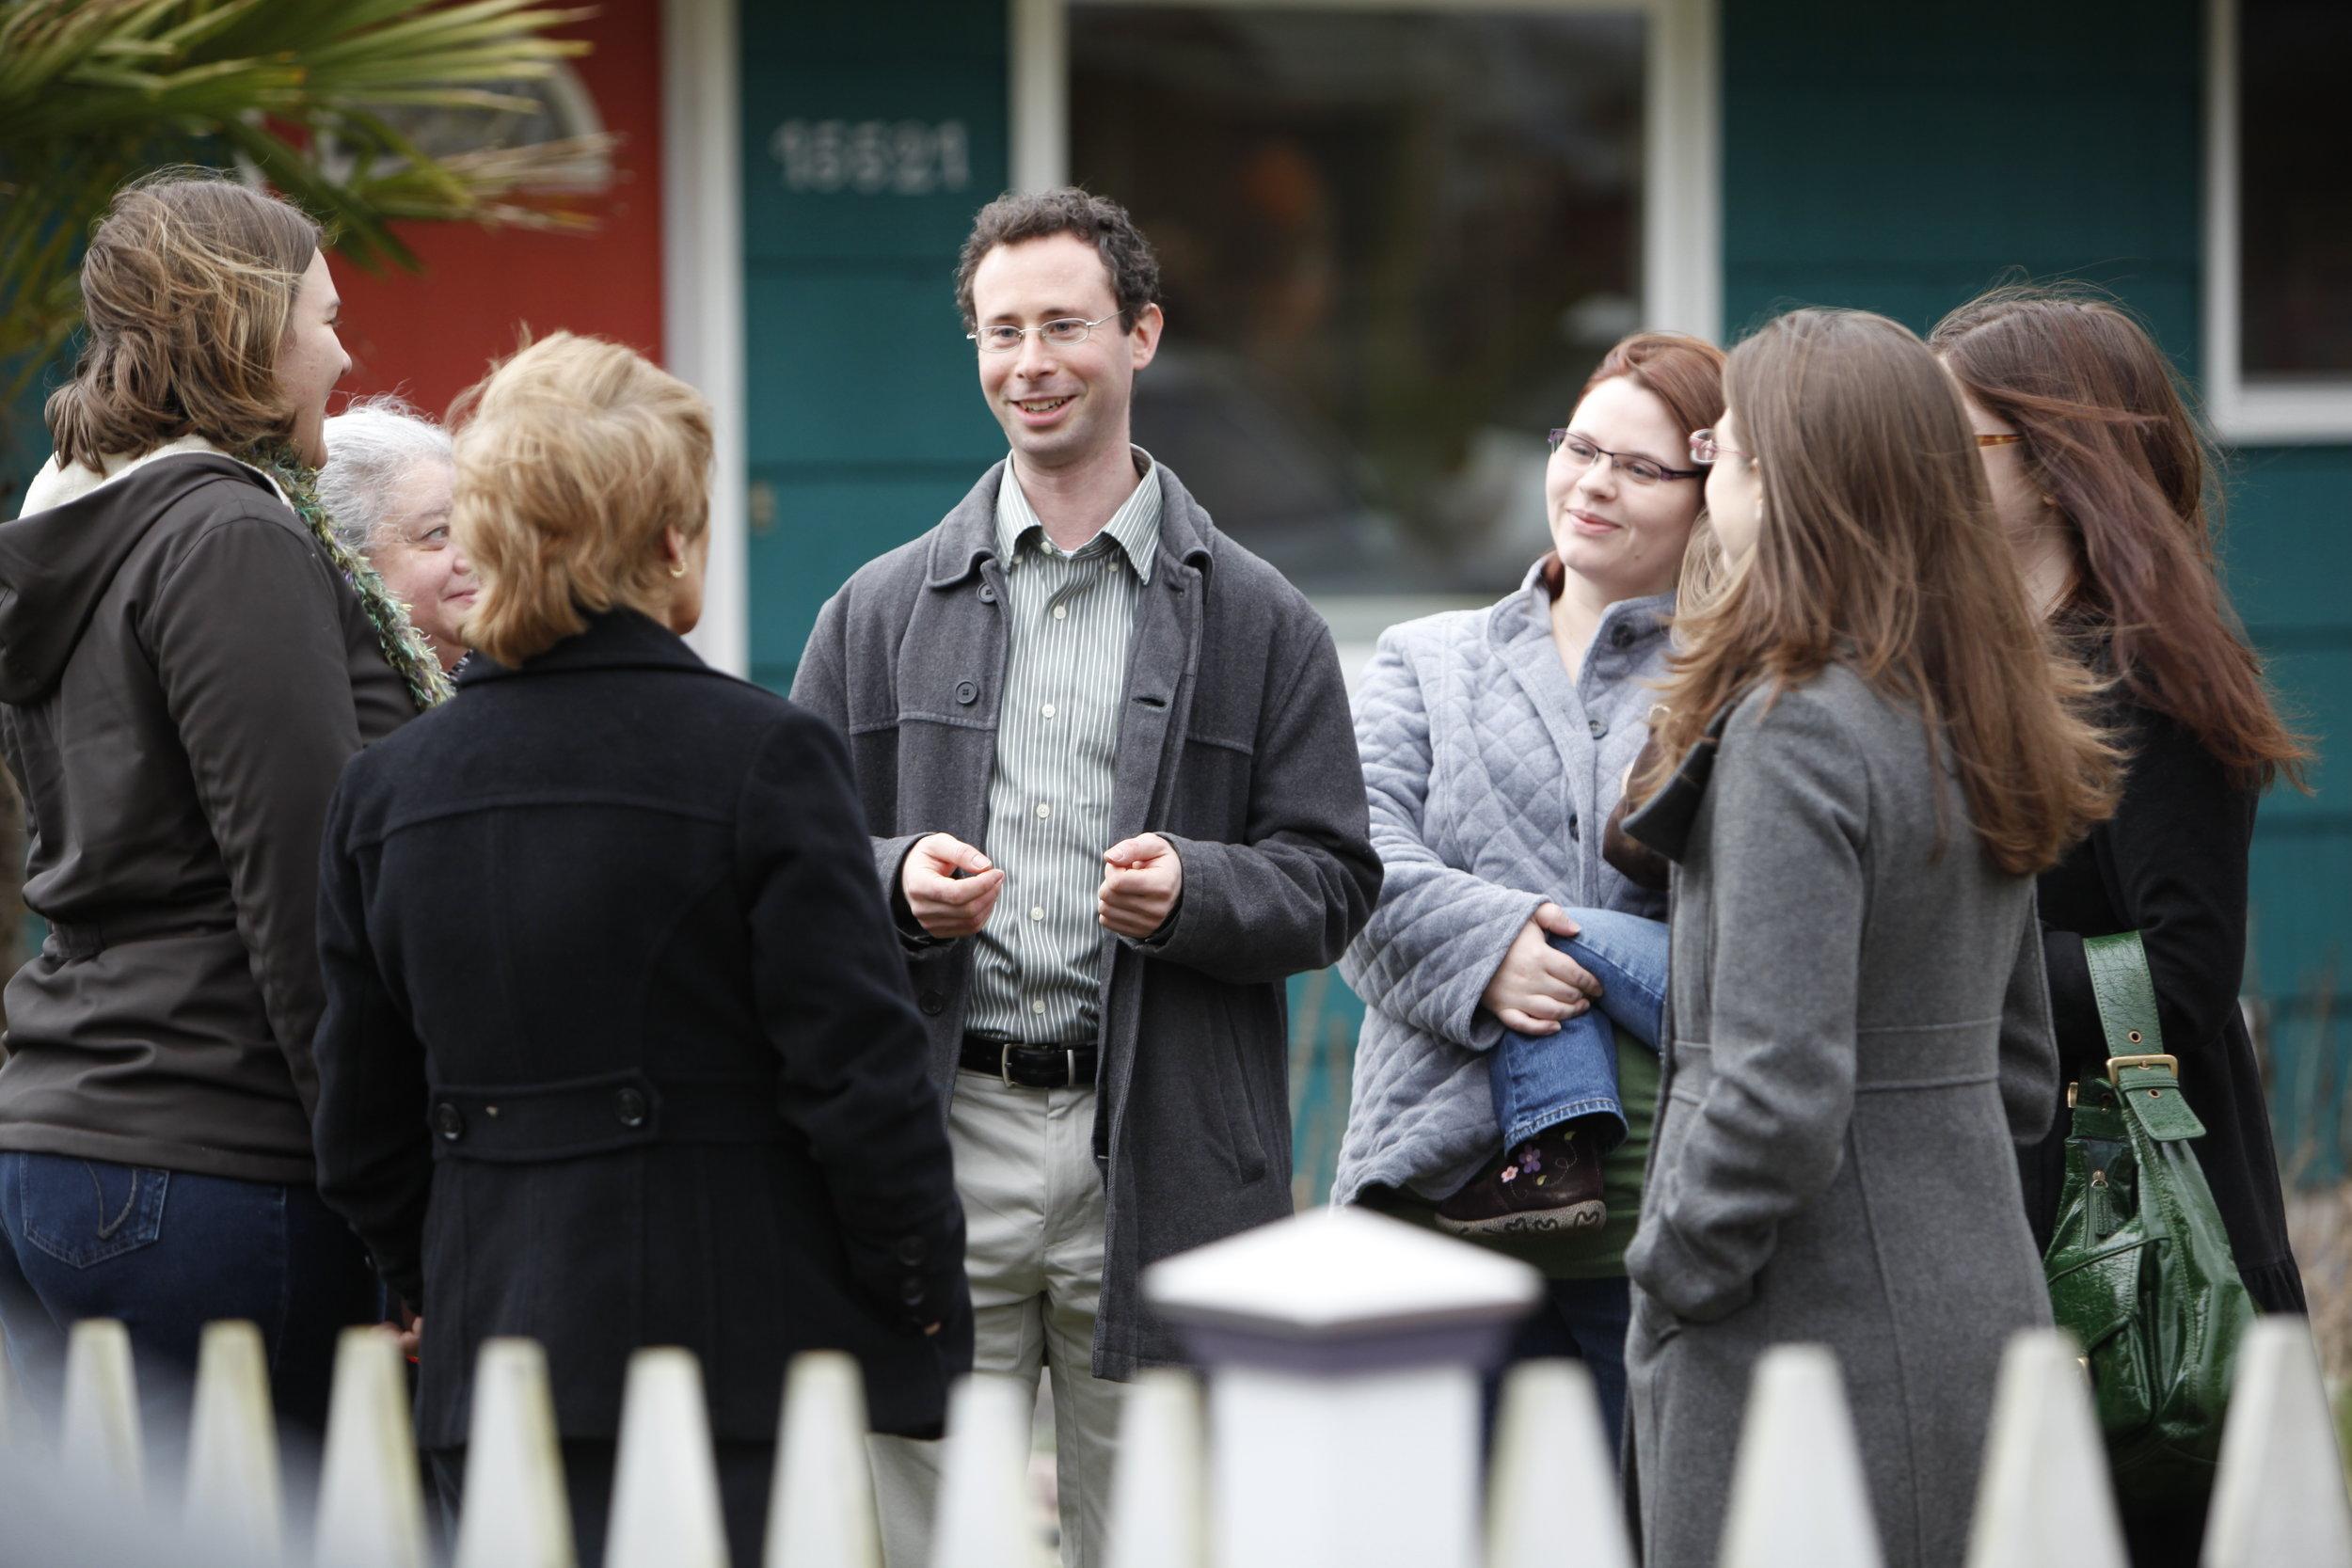 jesse-salomon-with-women-voters.jpg